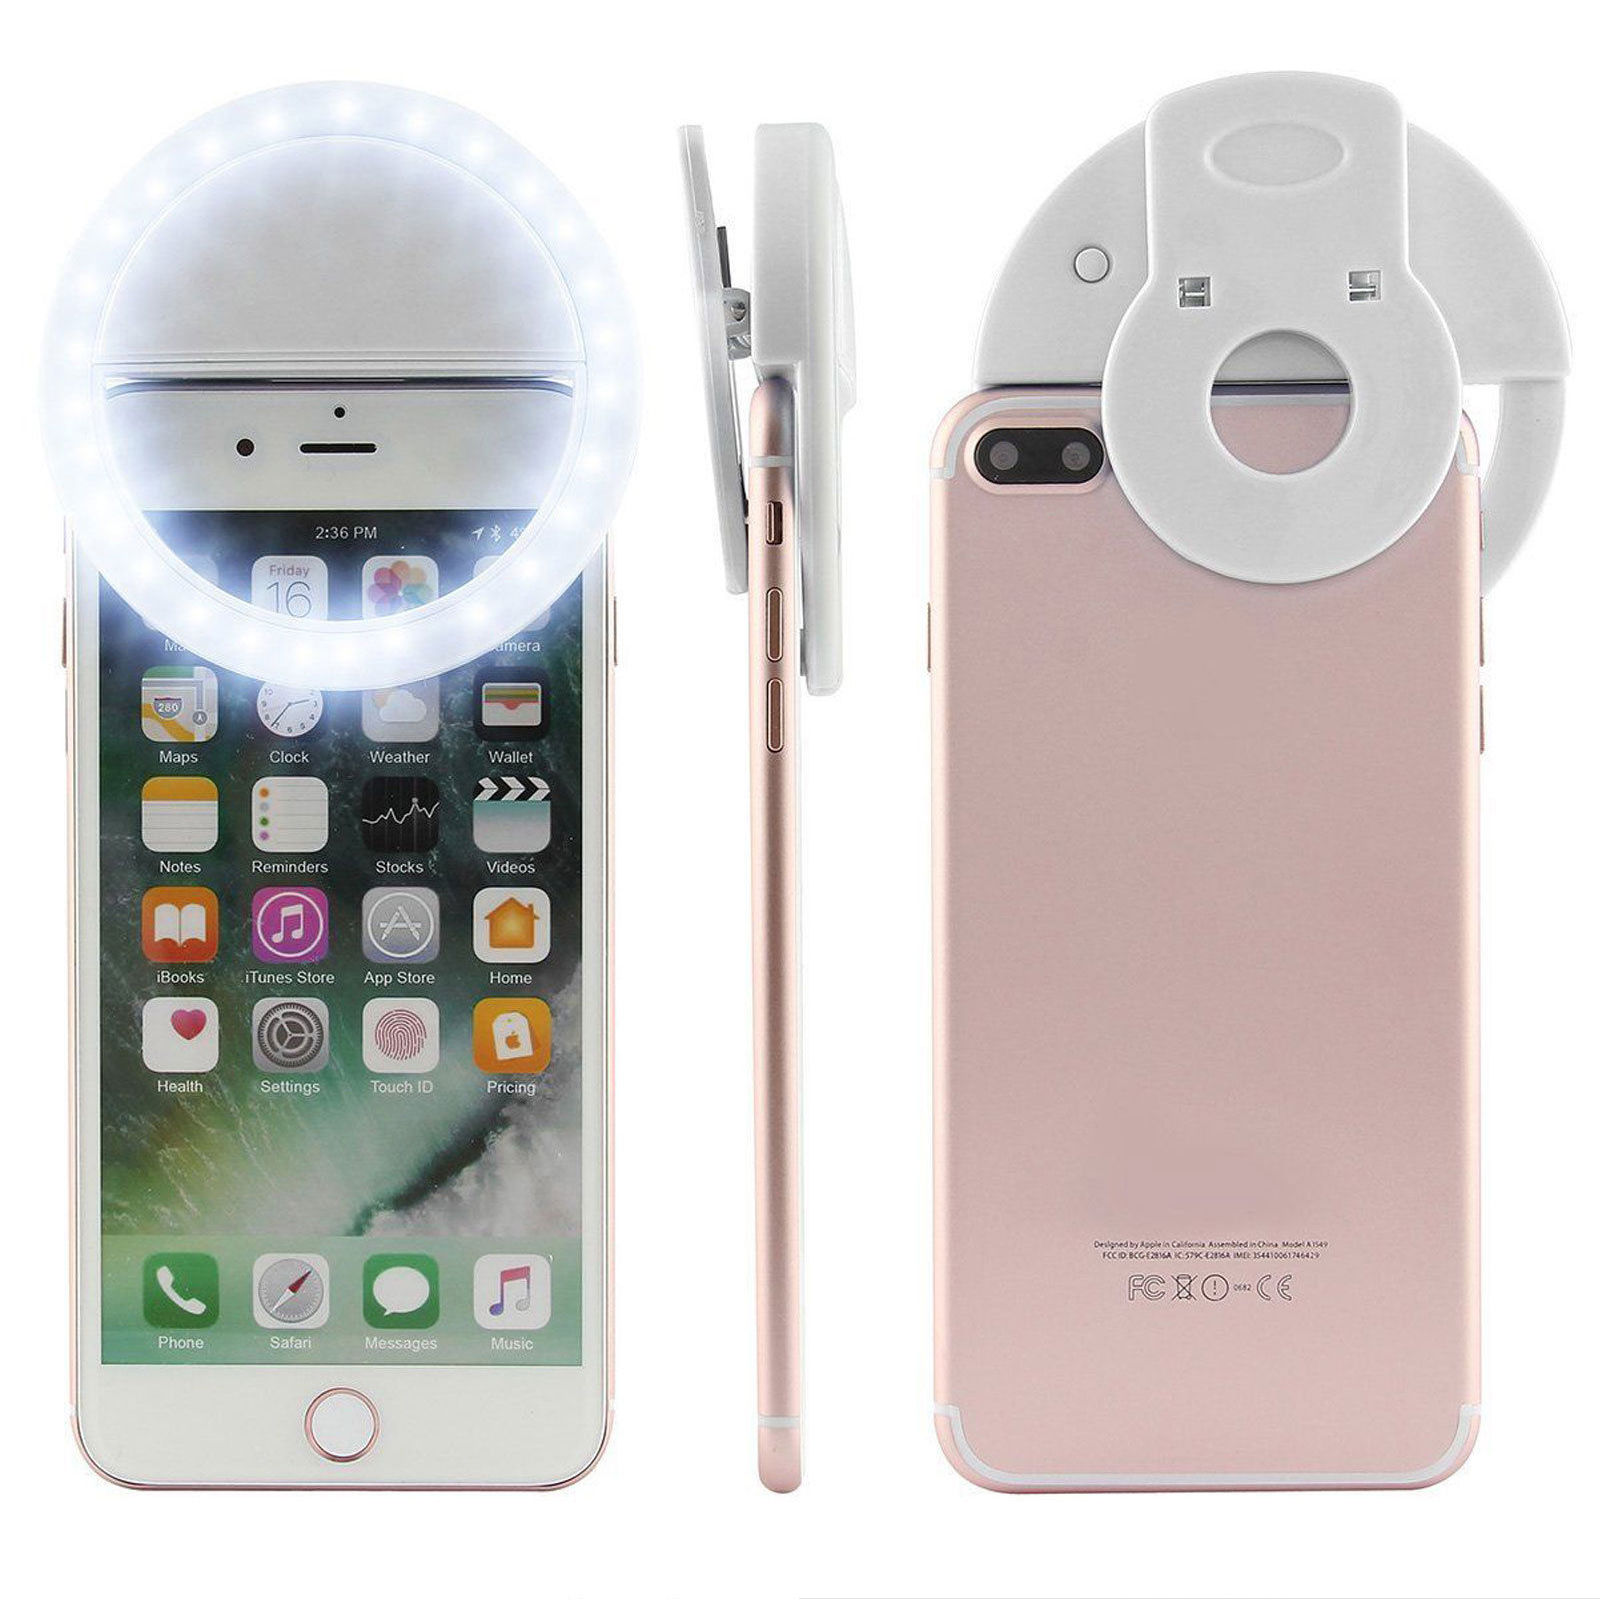 EEEKit 40 LED Selfie Fill Light Up Phone Ring Flash+Selfie Stick+Tripod+Remote